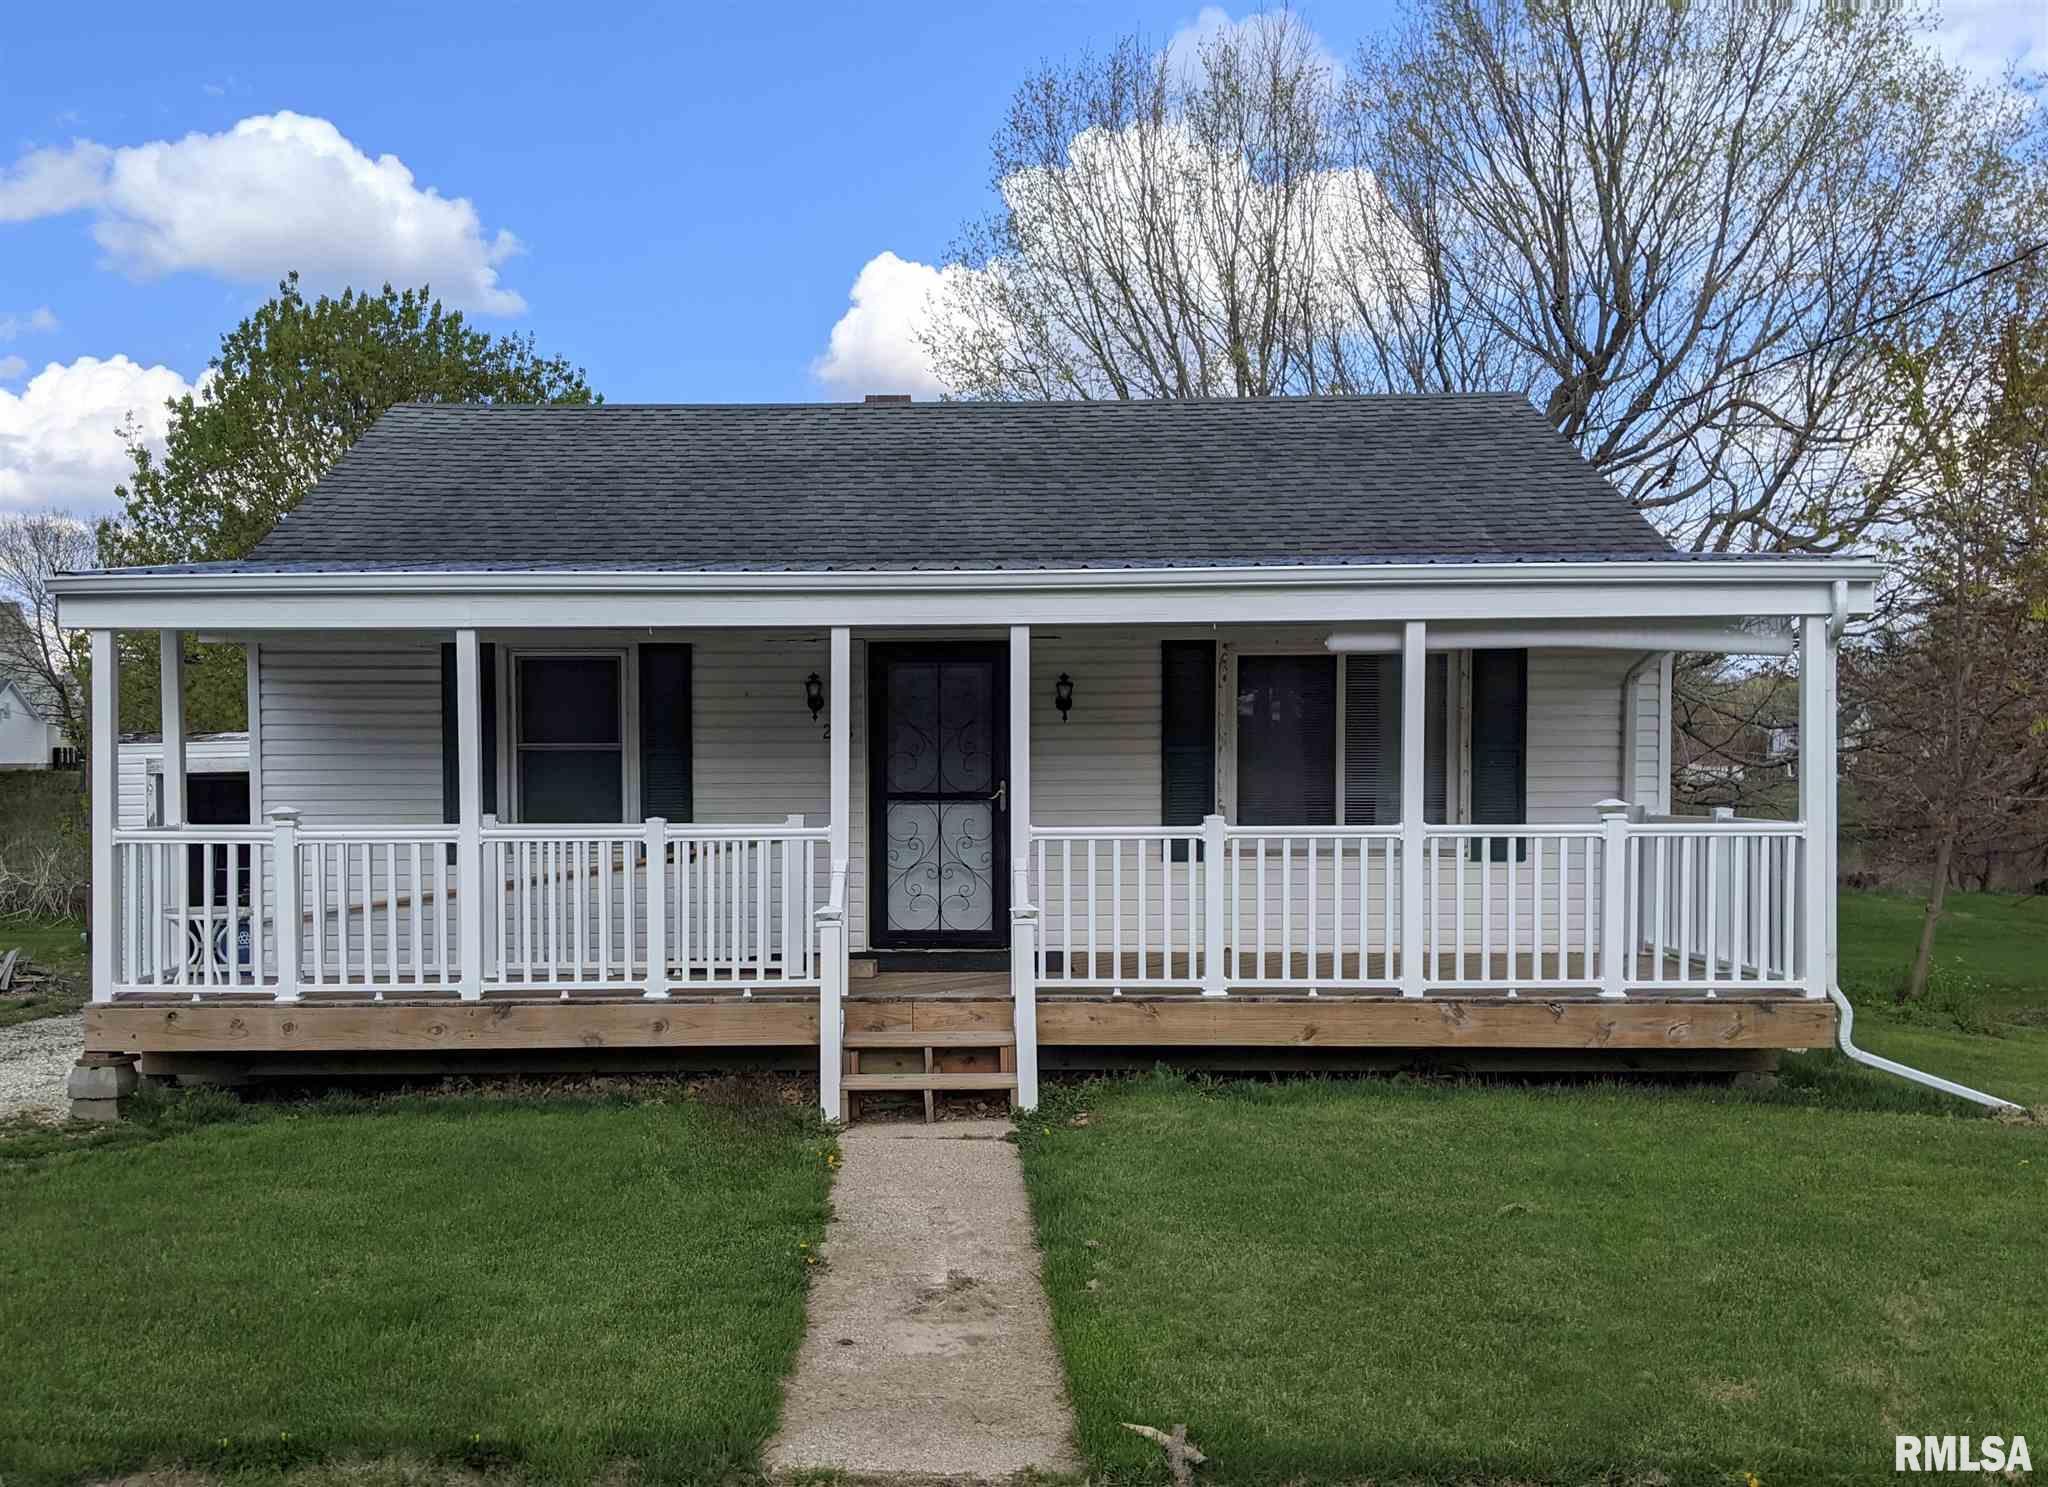 218 S HENDERSON Property Photo - Toulon, IL real estate listing